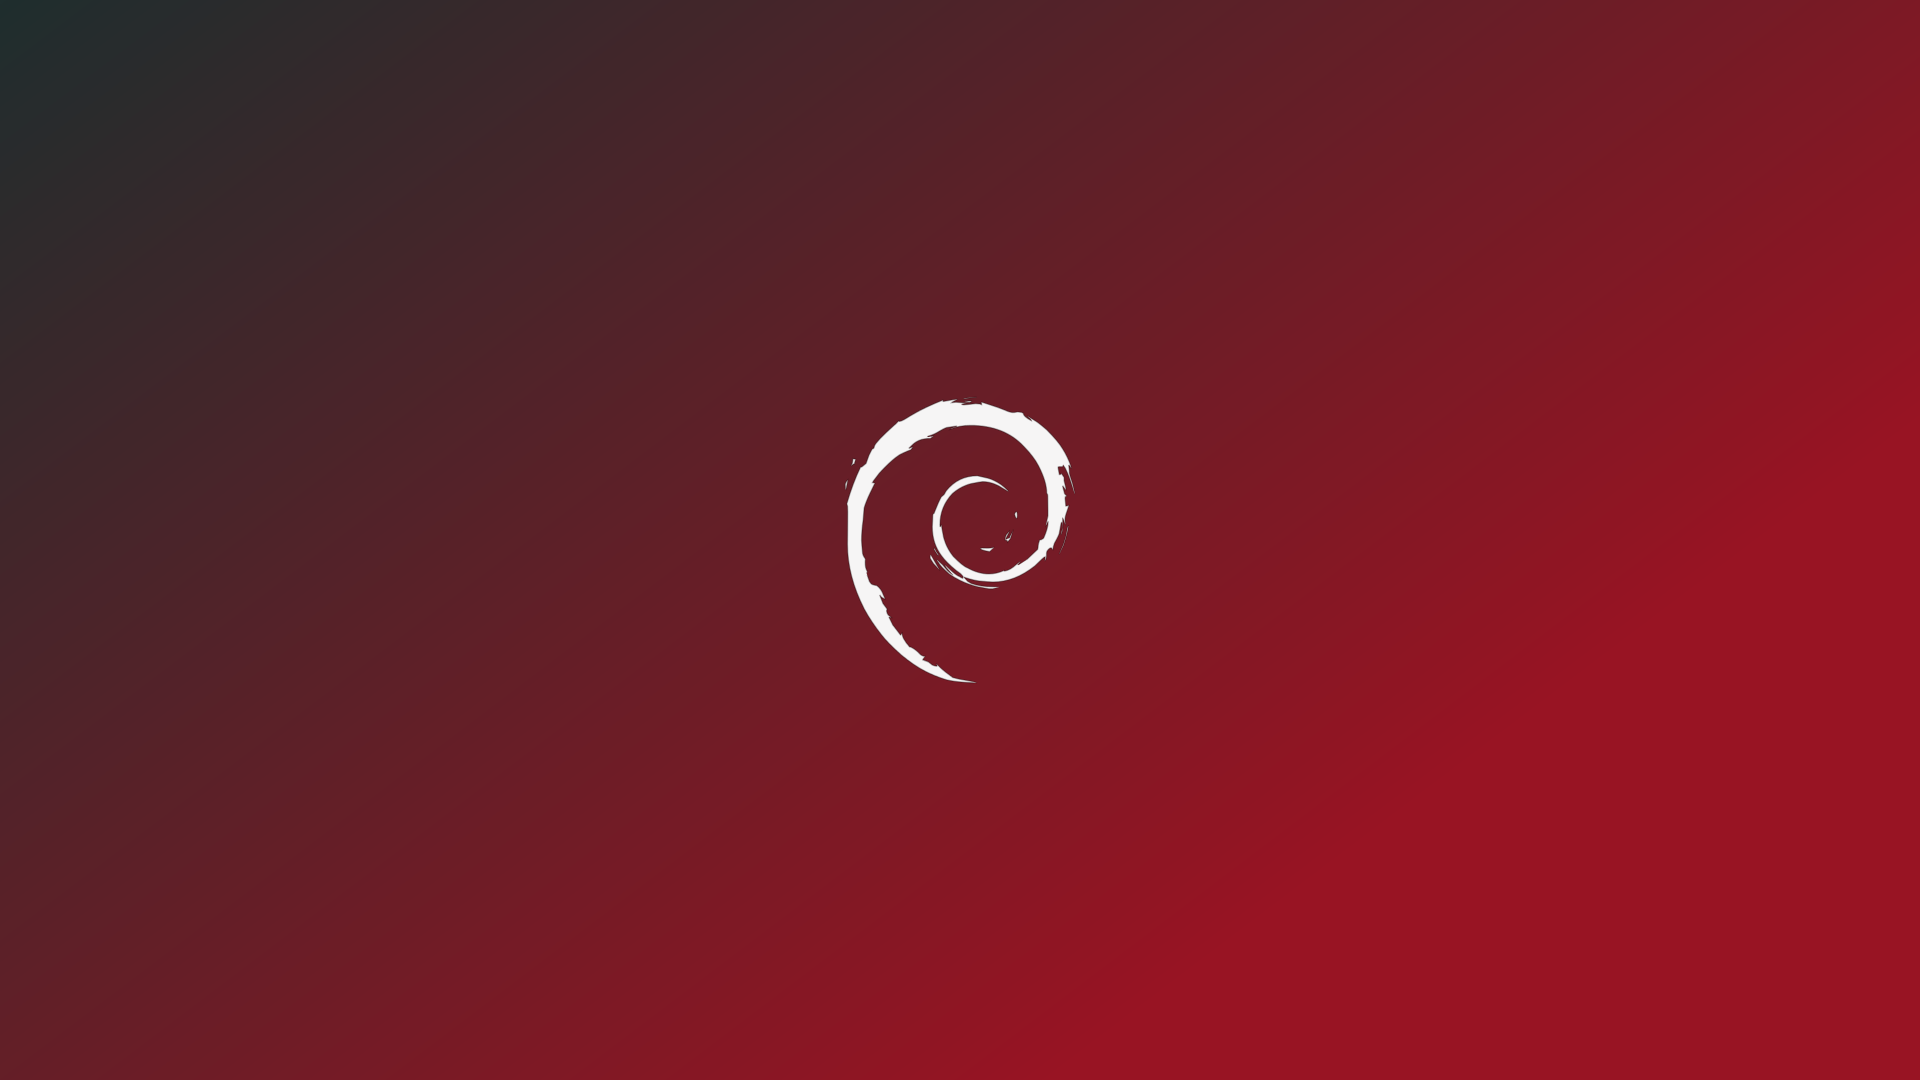 Simple Red Debian Wallpaper By Ivanmladenovi On Deviantart